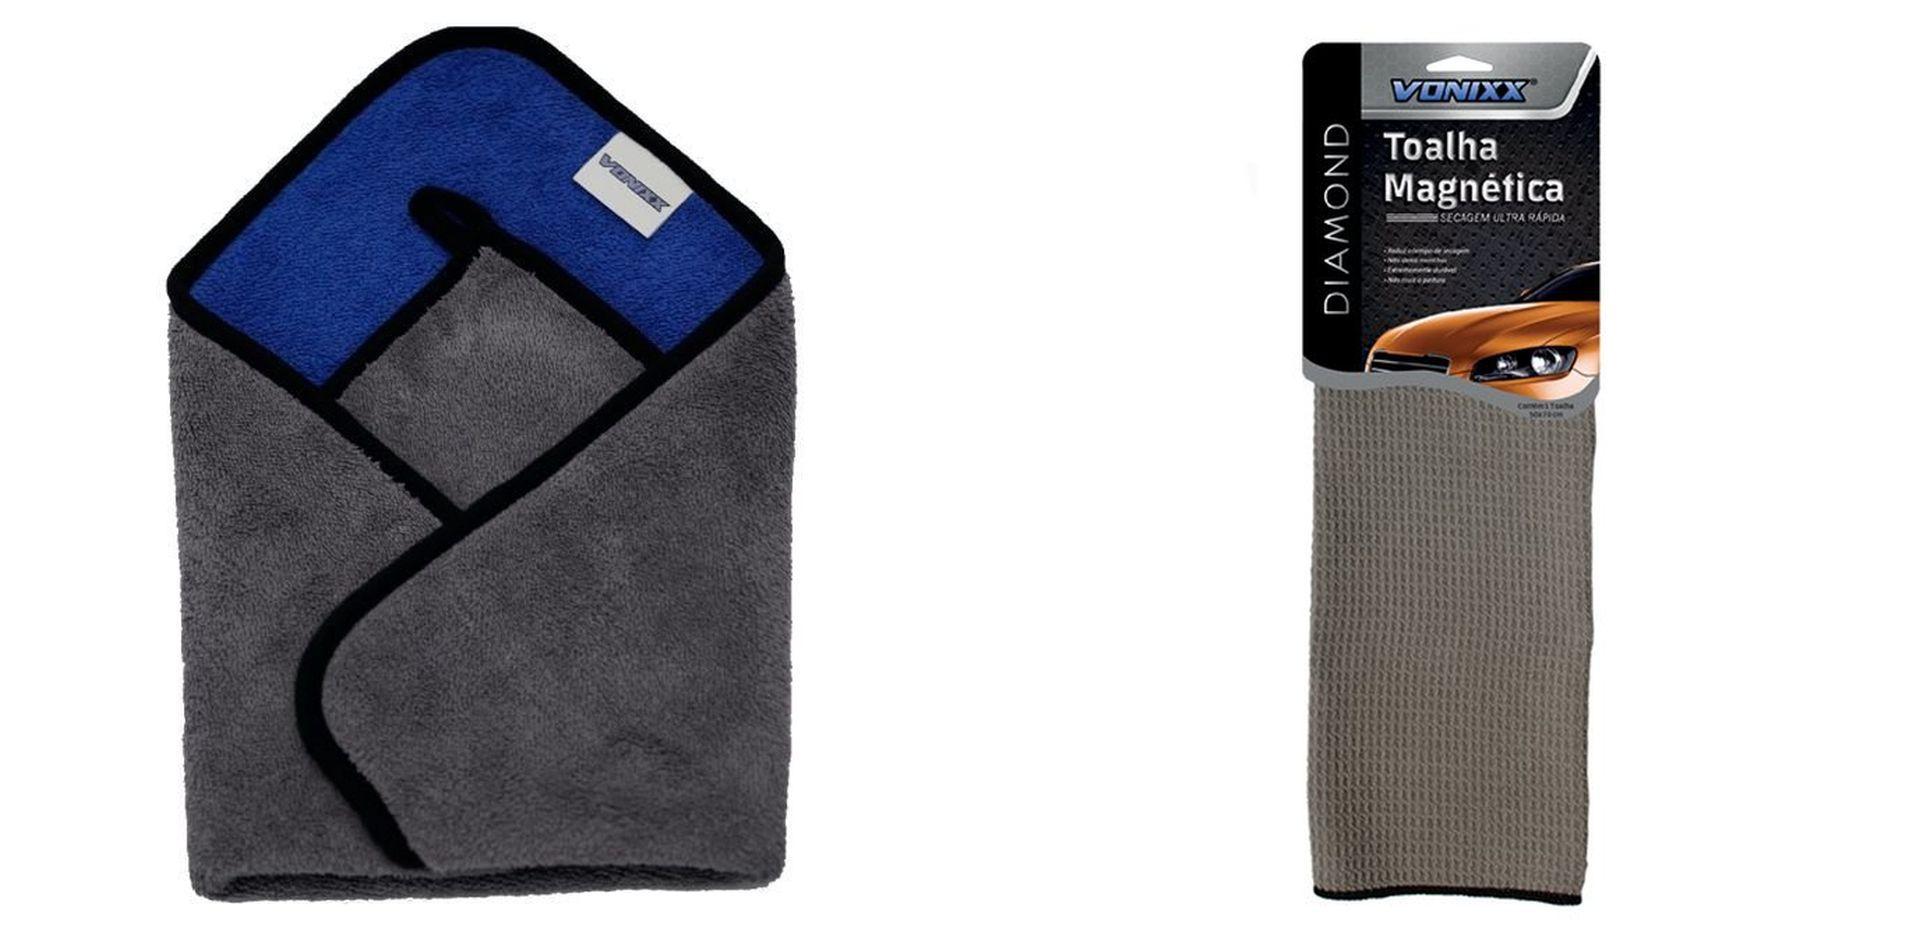 Kit Toalha Magnetica 50x70cm+ Toalha de Microfibra 40x40 Vonixx